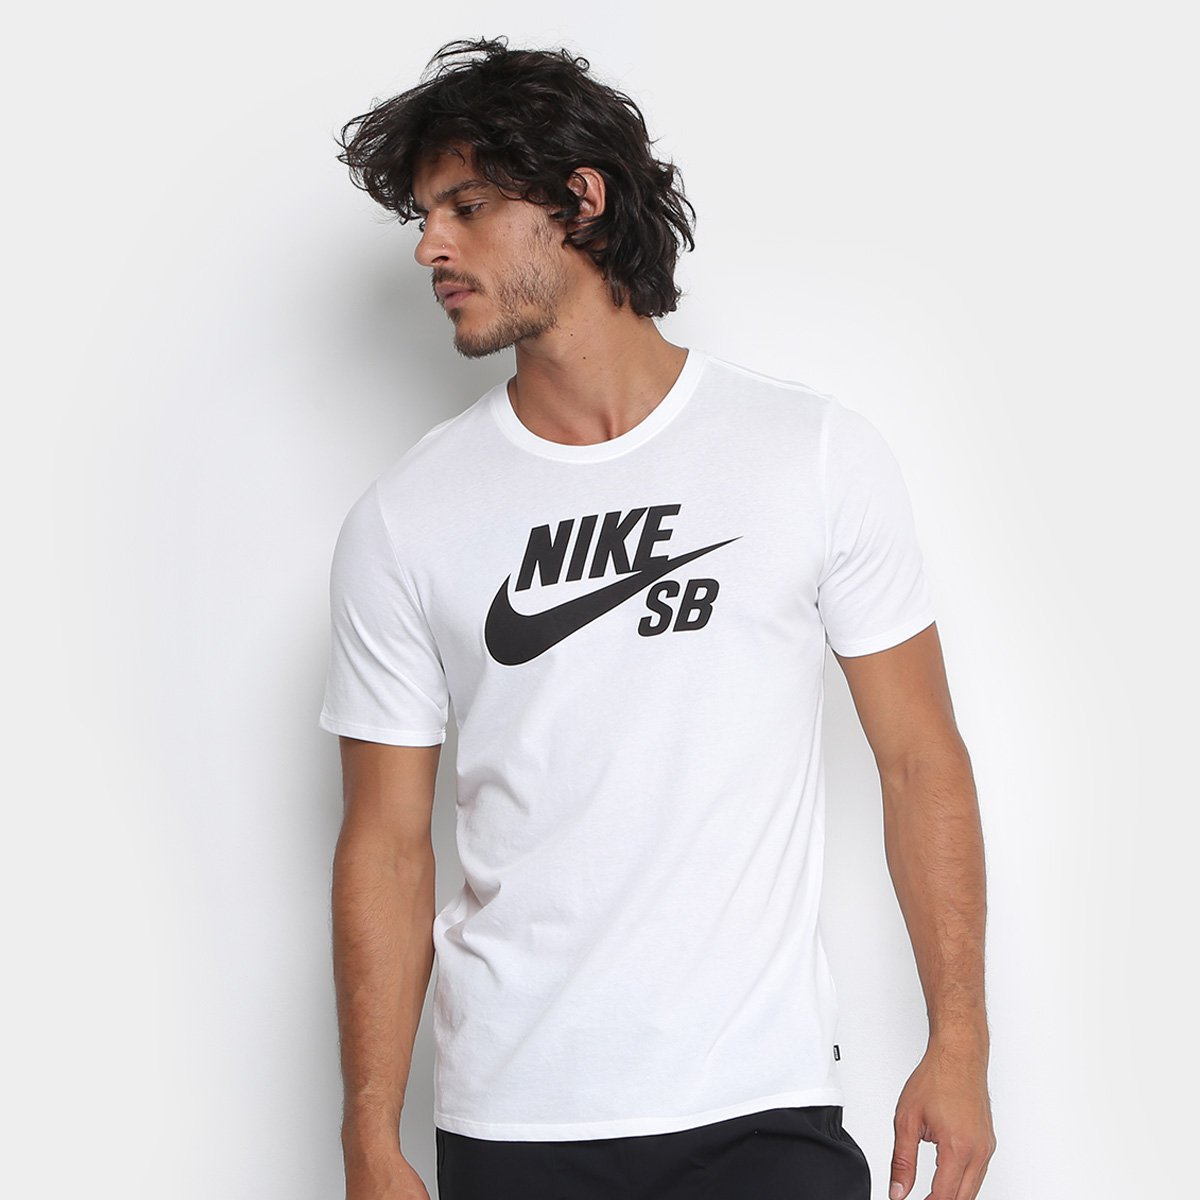 ffdbab8ced Camiseta Nike Sb Logo Masculina - Branco e Preto